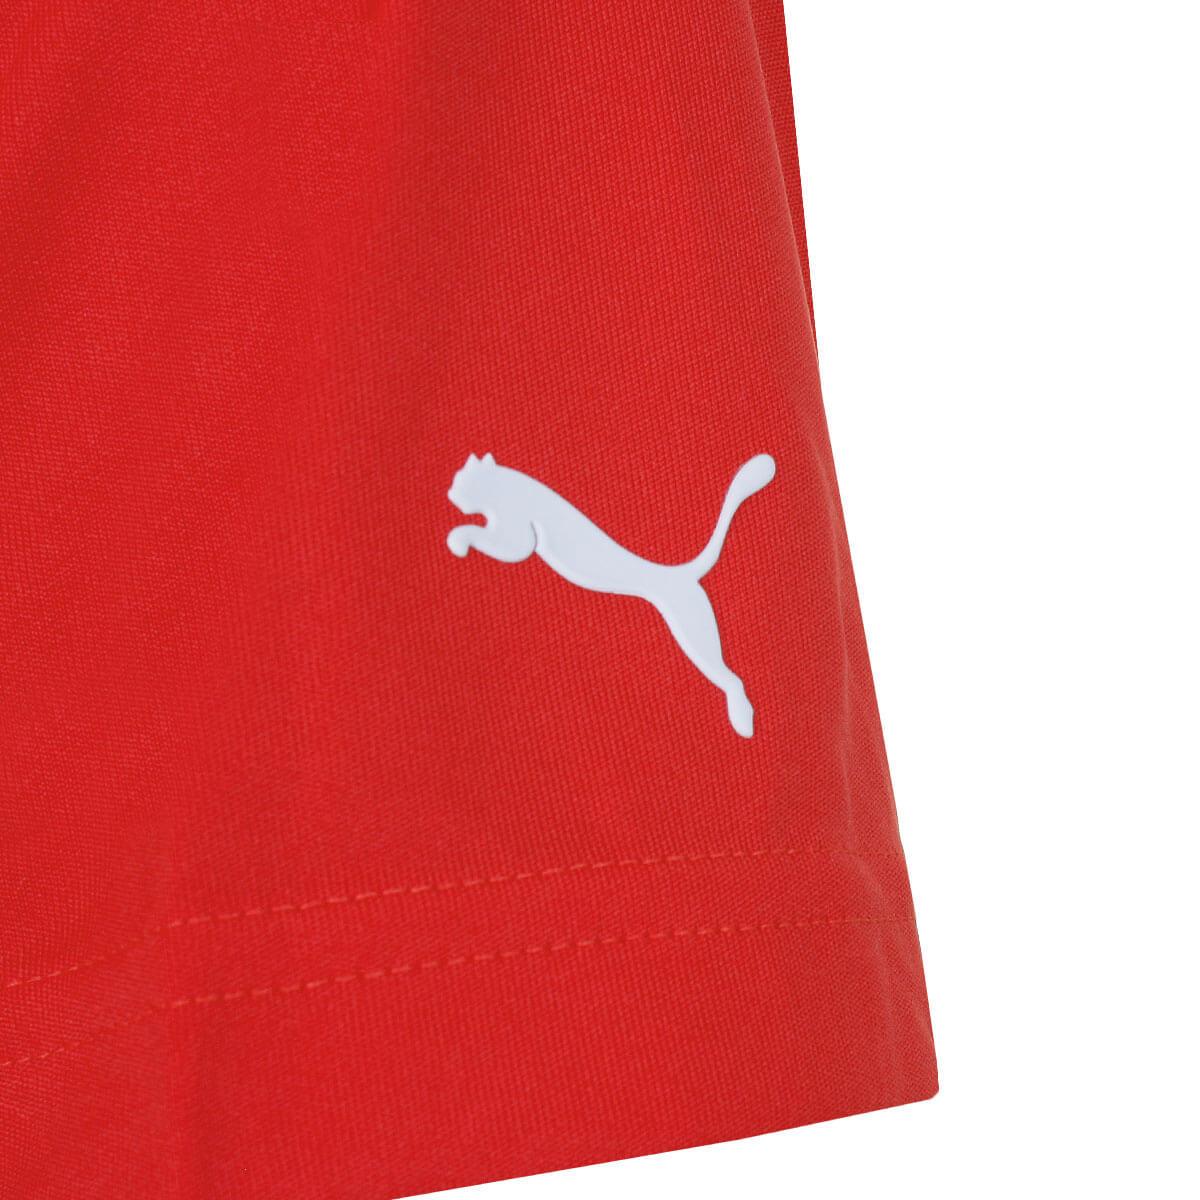 Puma-Golf-Mens-Essential-Pounce-Cresting-DryCell-Tech-Polo-Shirt-46-OFF-RRP thumbnail 16